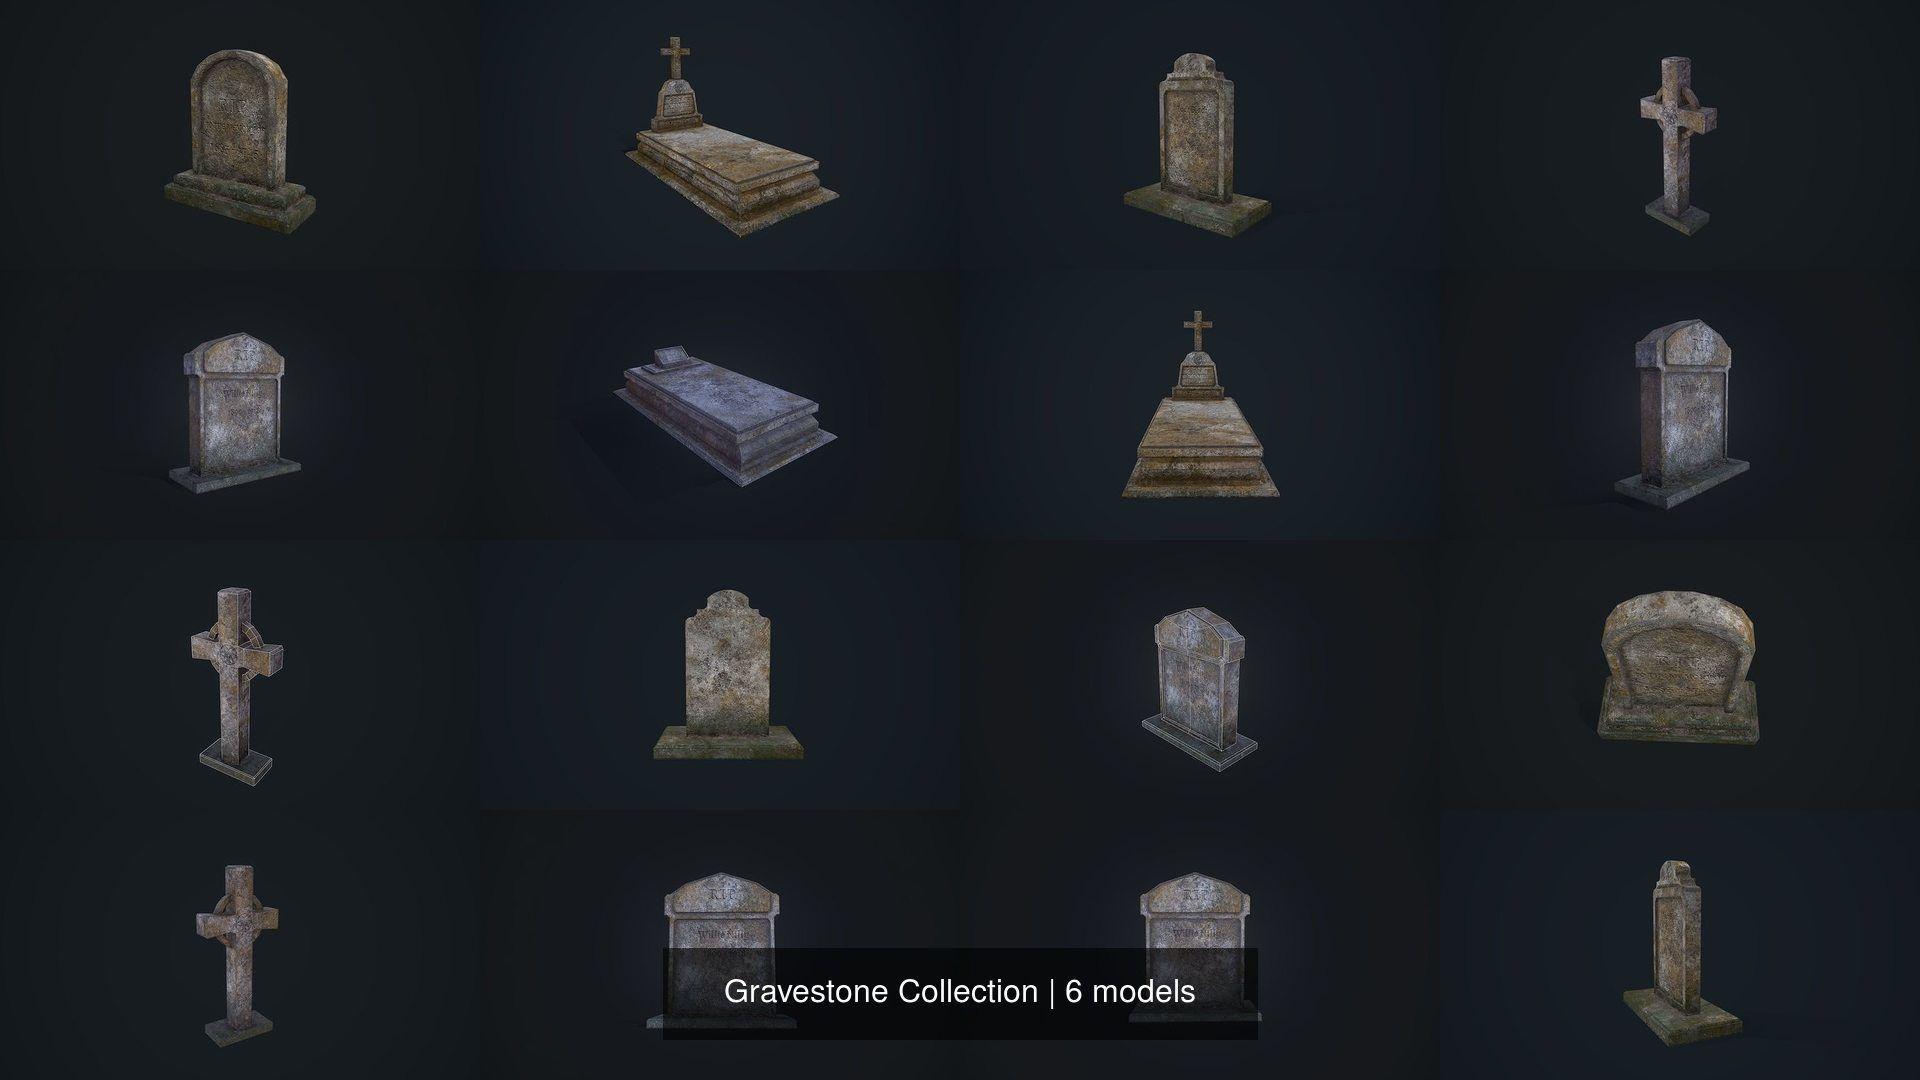 Gravestone Collection